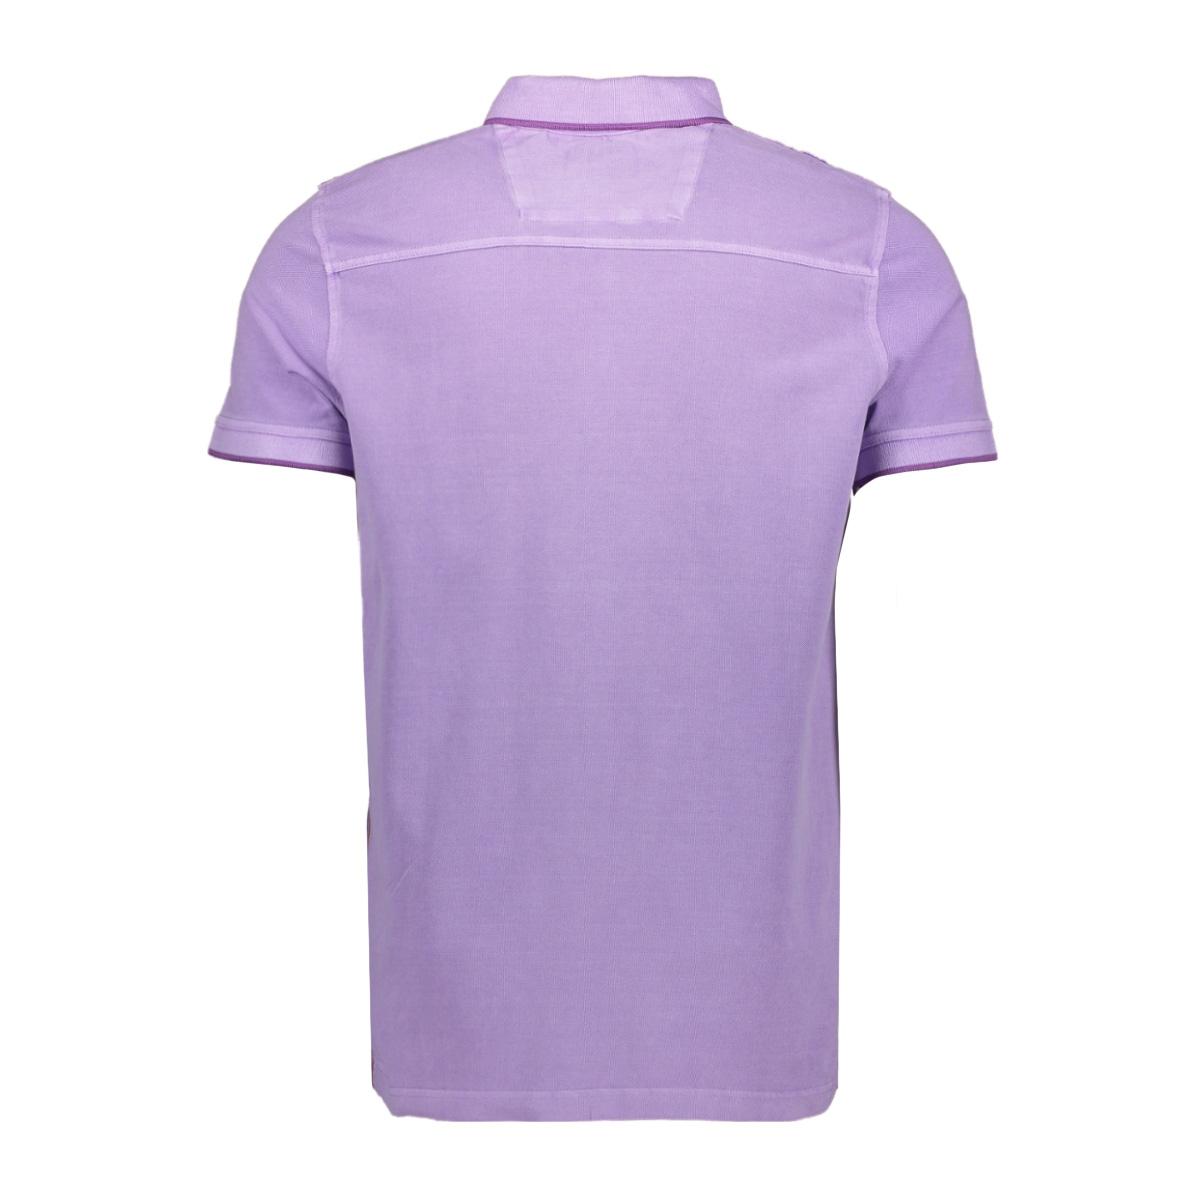 short sleeve polo ppss193850 pme legend polo 4243